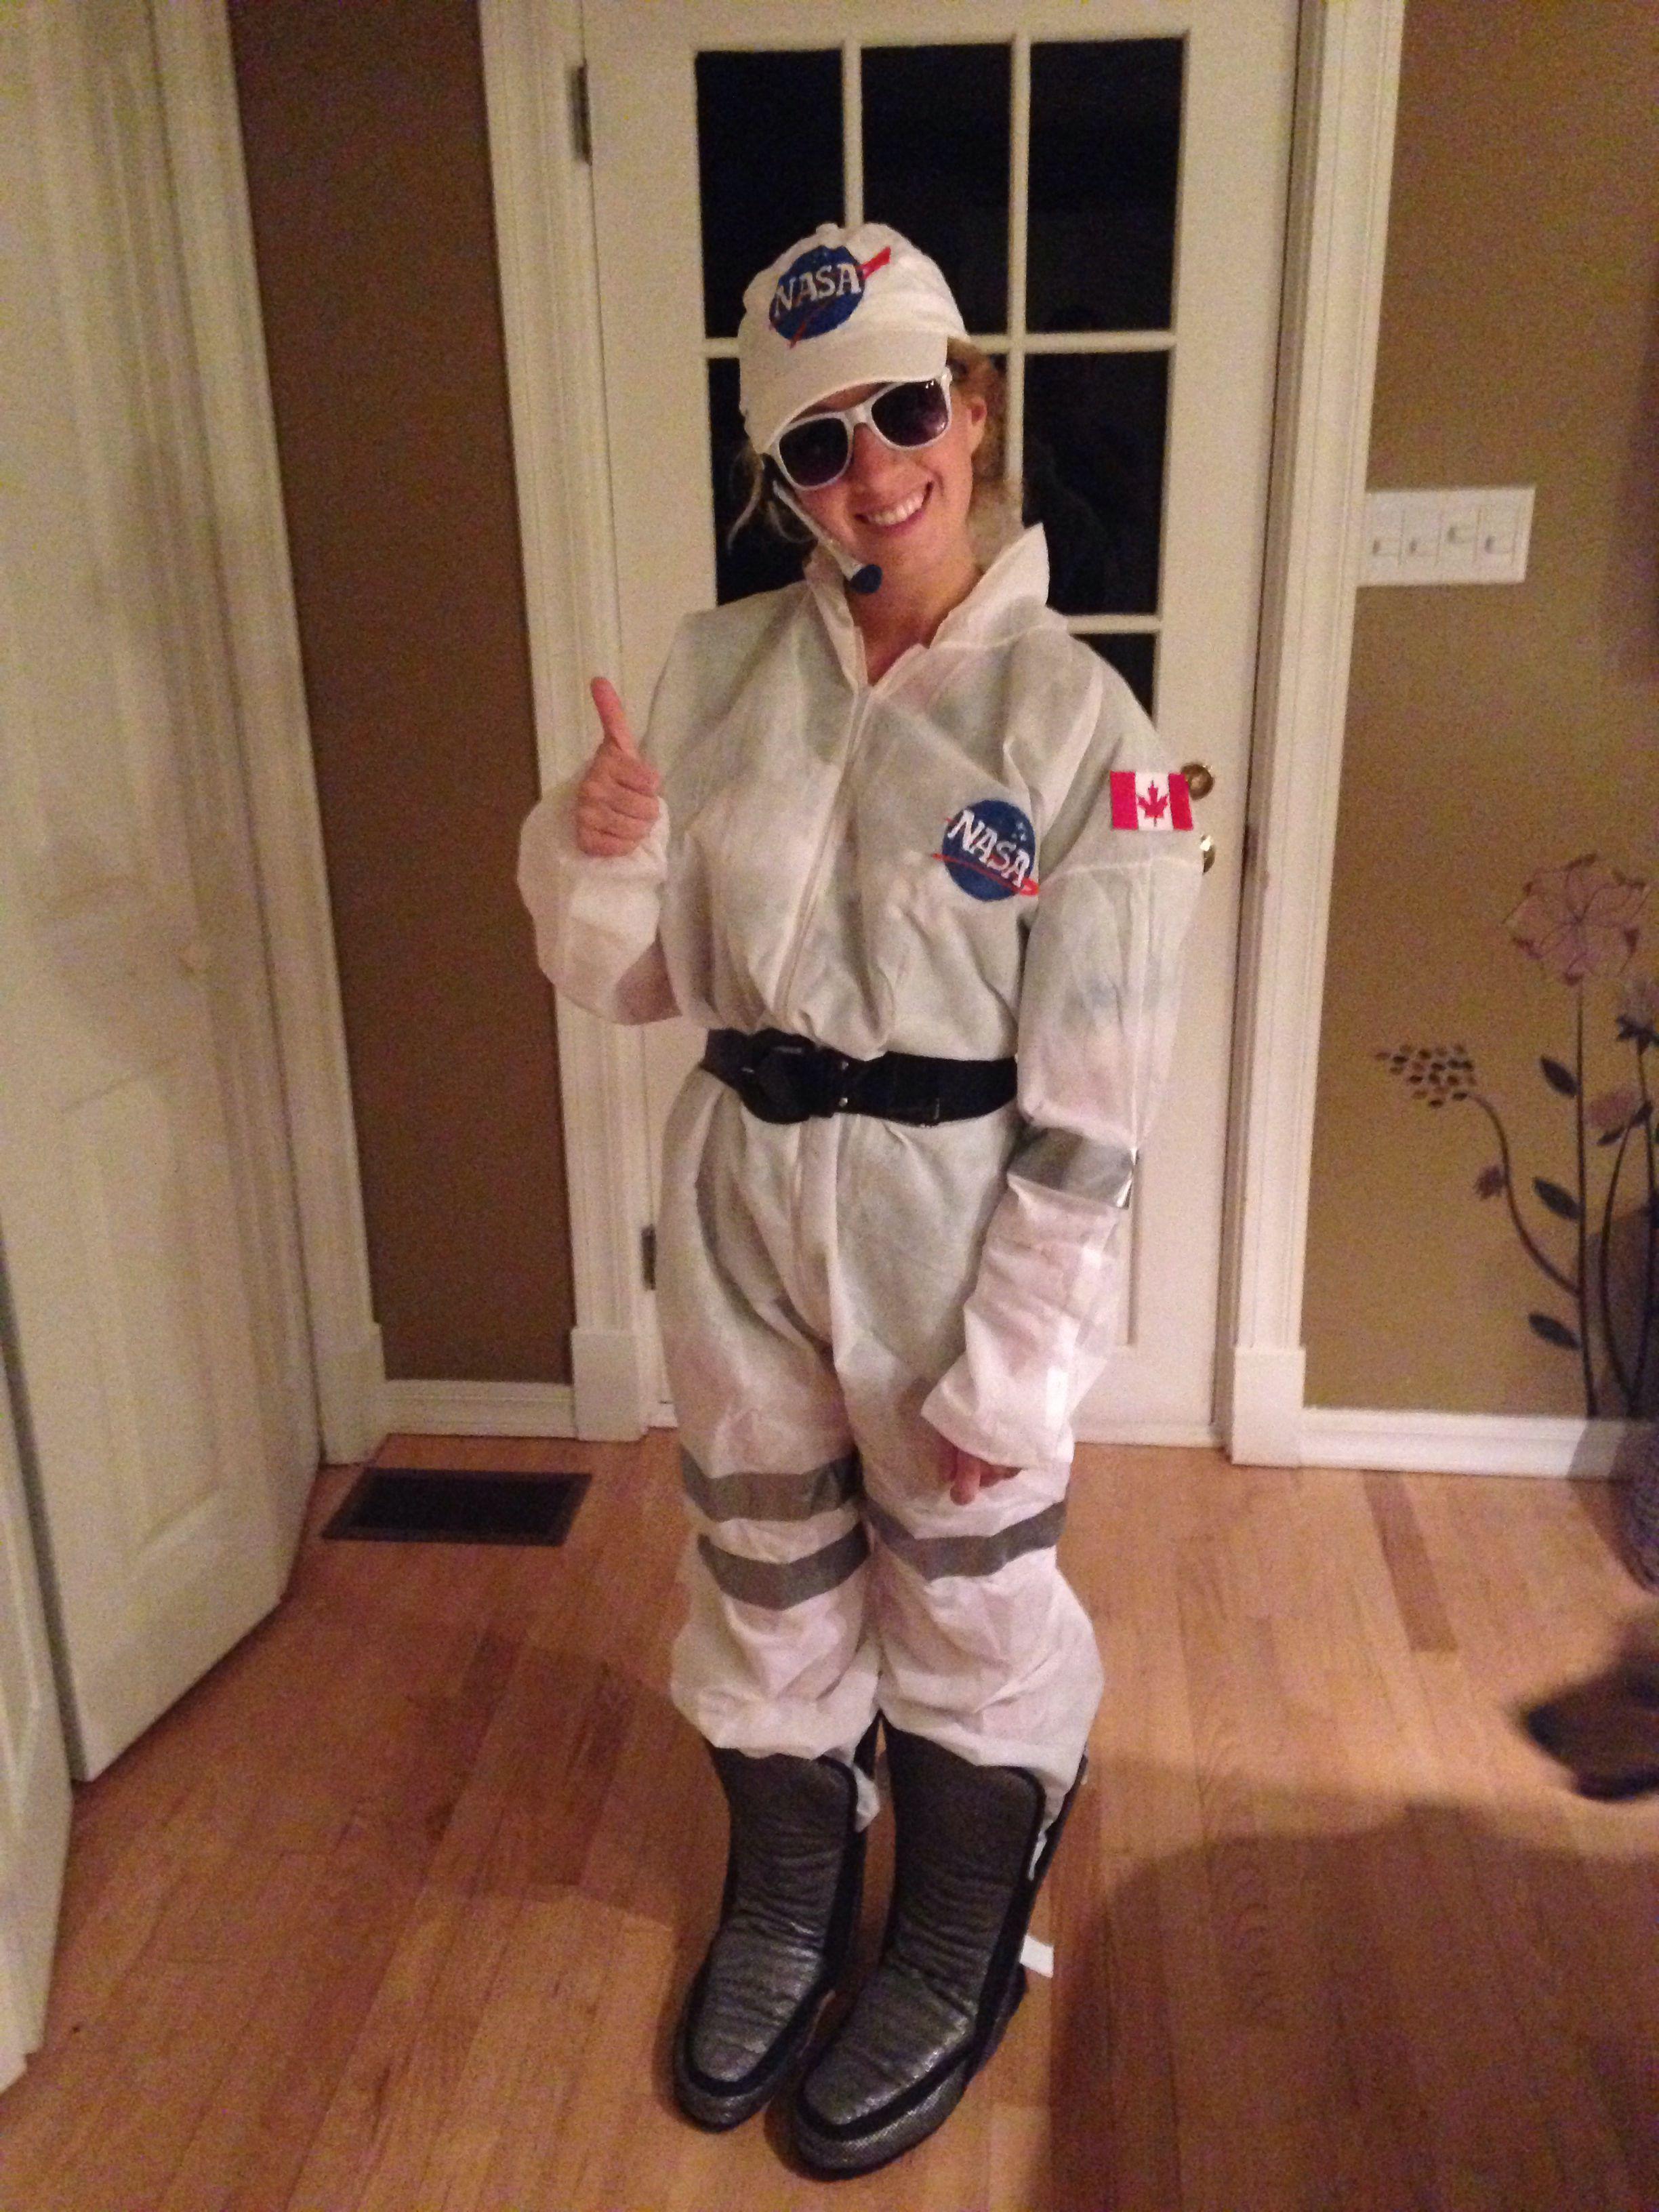 Diy Astronaut Costume Astronaut Costume Diy Astronaut